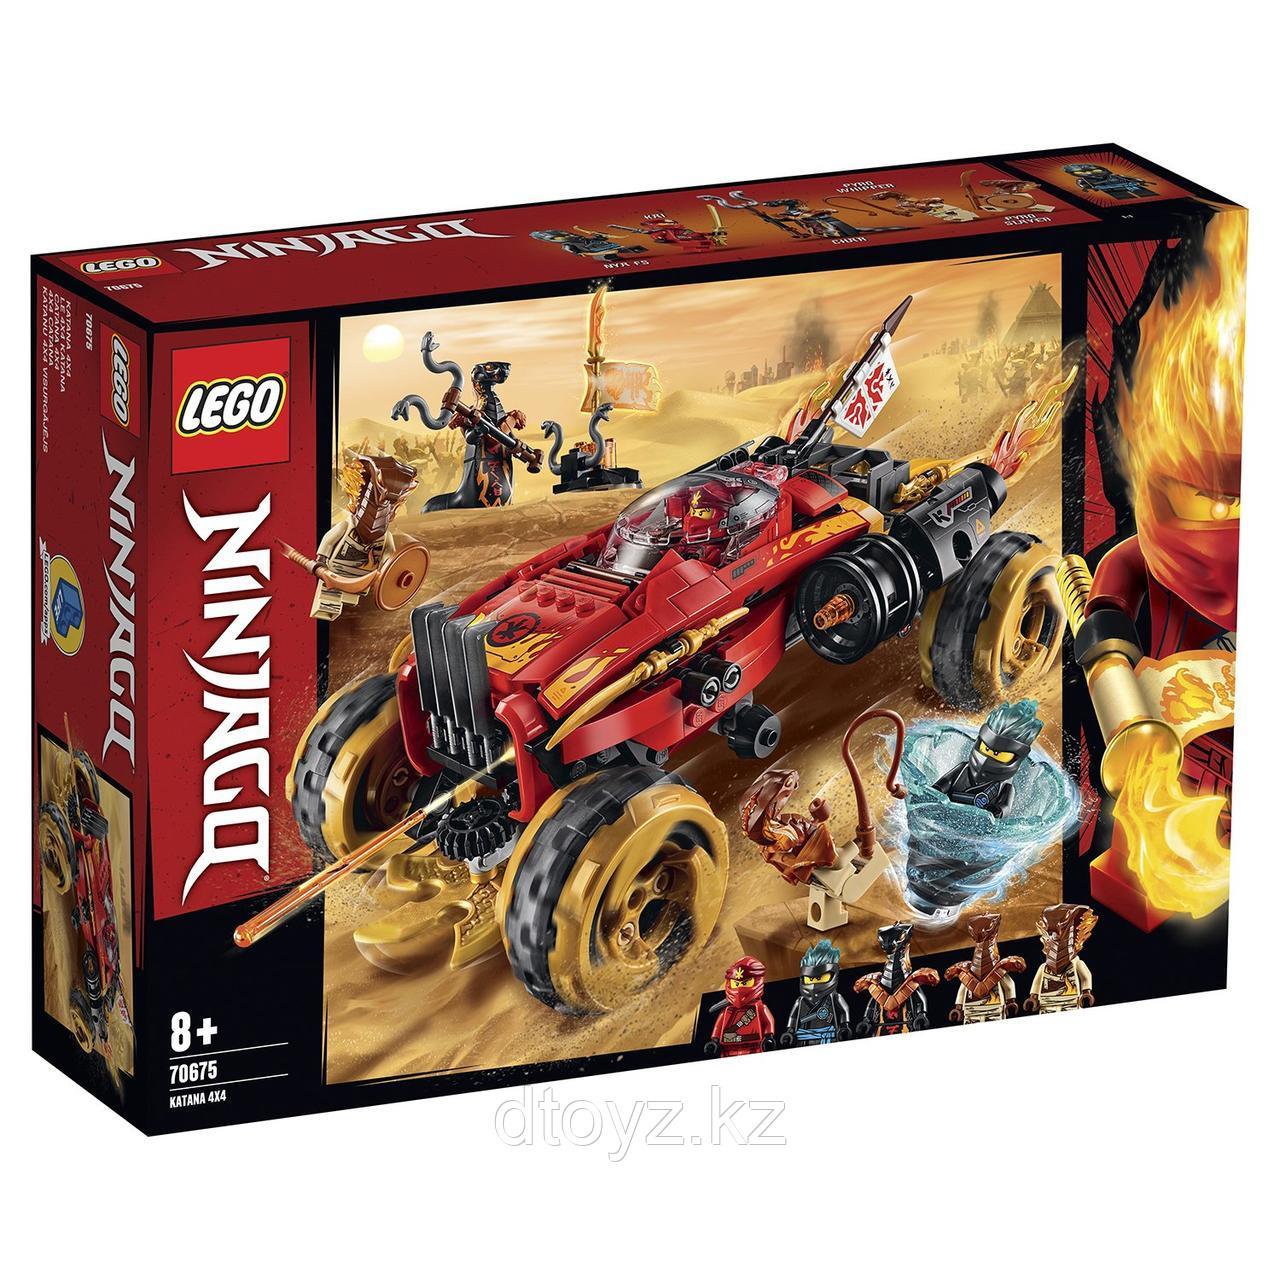 Lego Ninjago 70675 Внедорожник Катана 4x4, Лего Ниндзяго - фото 1